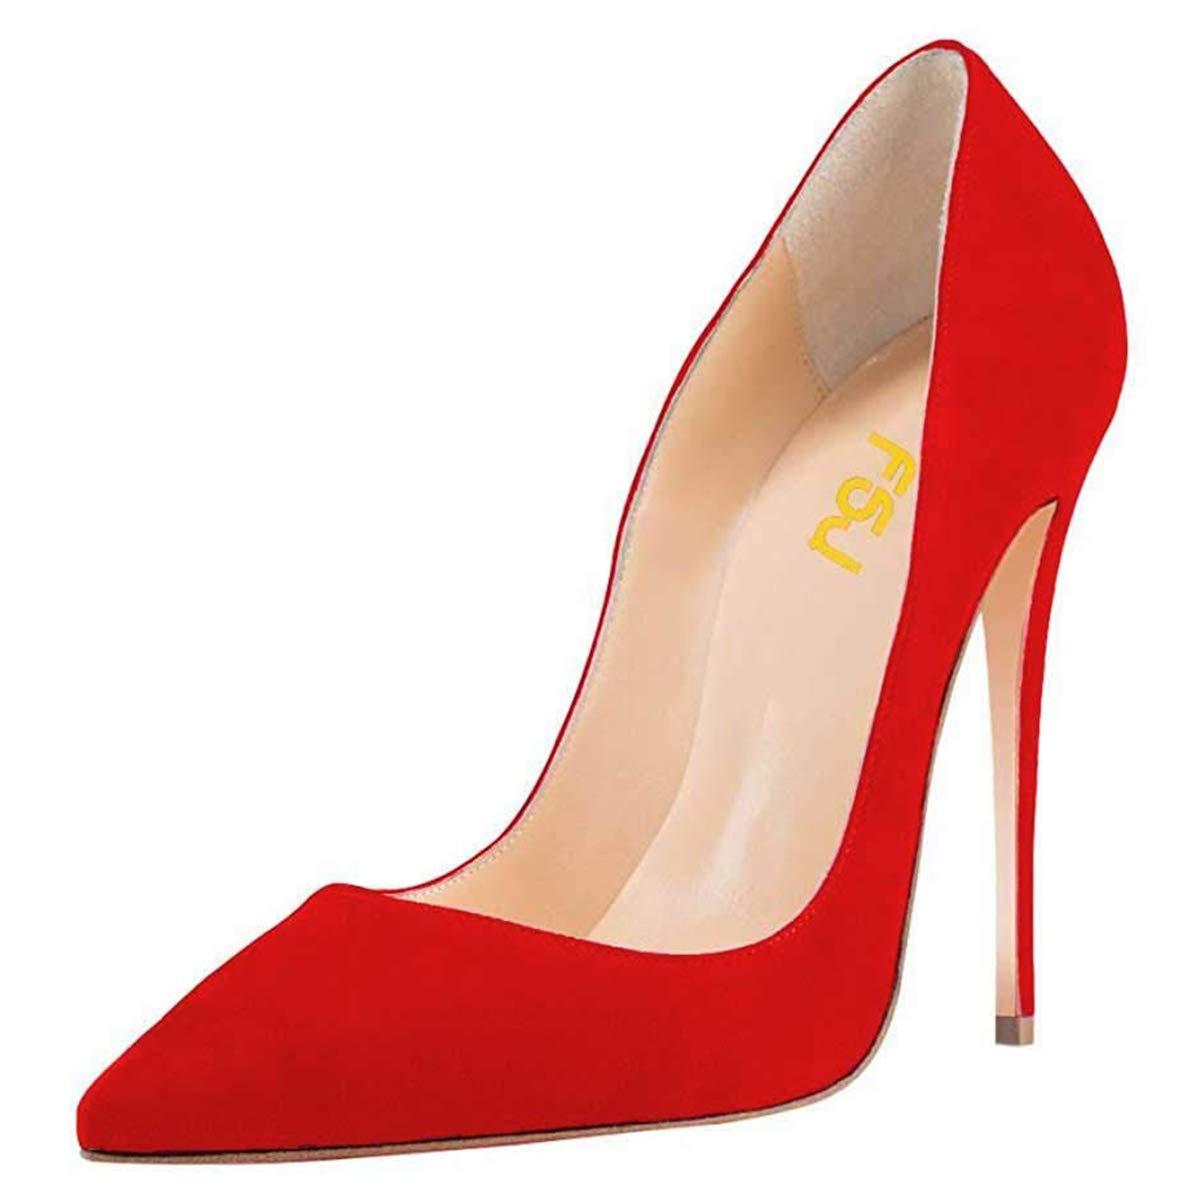 2abf49635eaeb FSJ Women Sexy Suede Pointed Toe Pumps 12 cm High Heels Stilettos ...